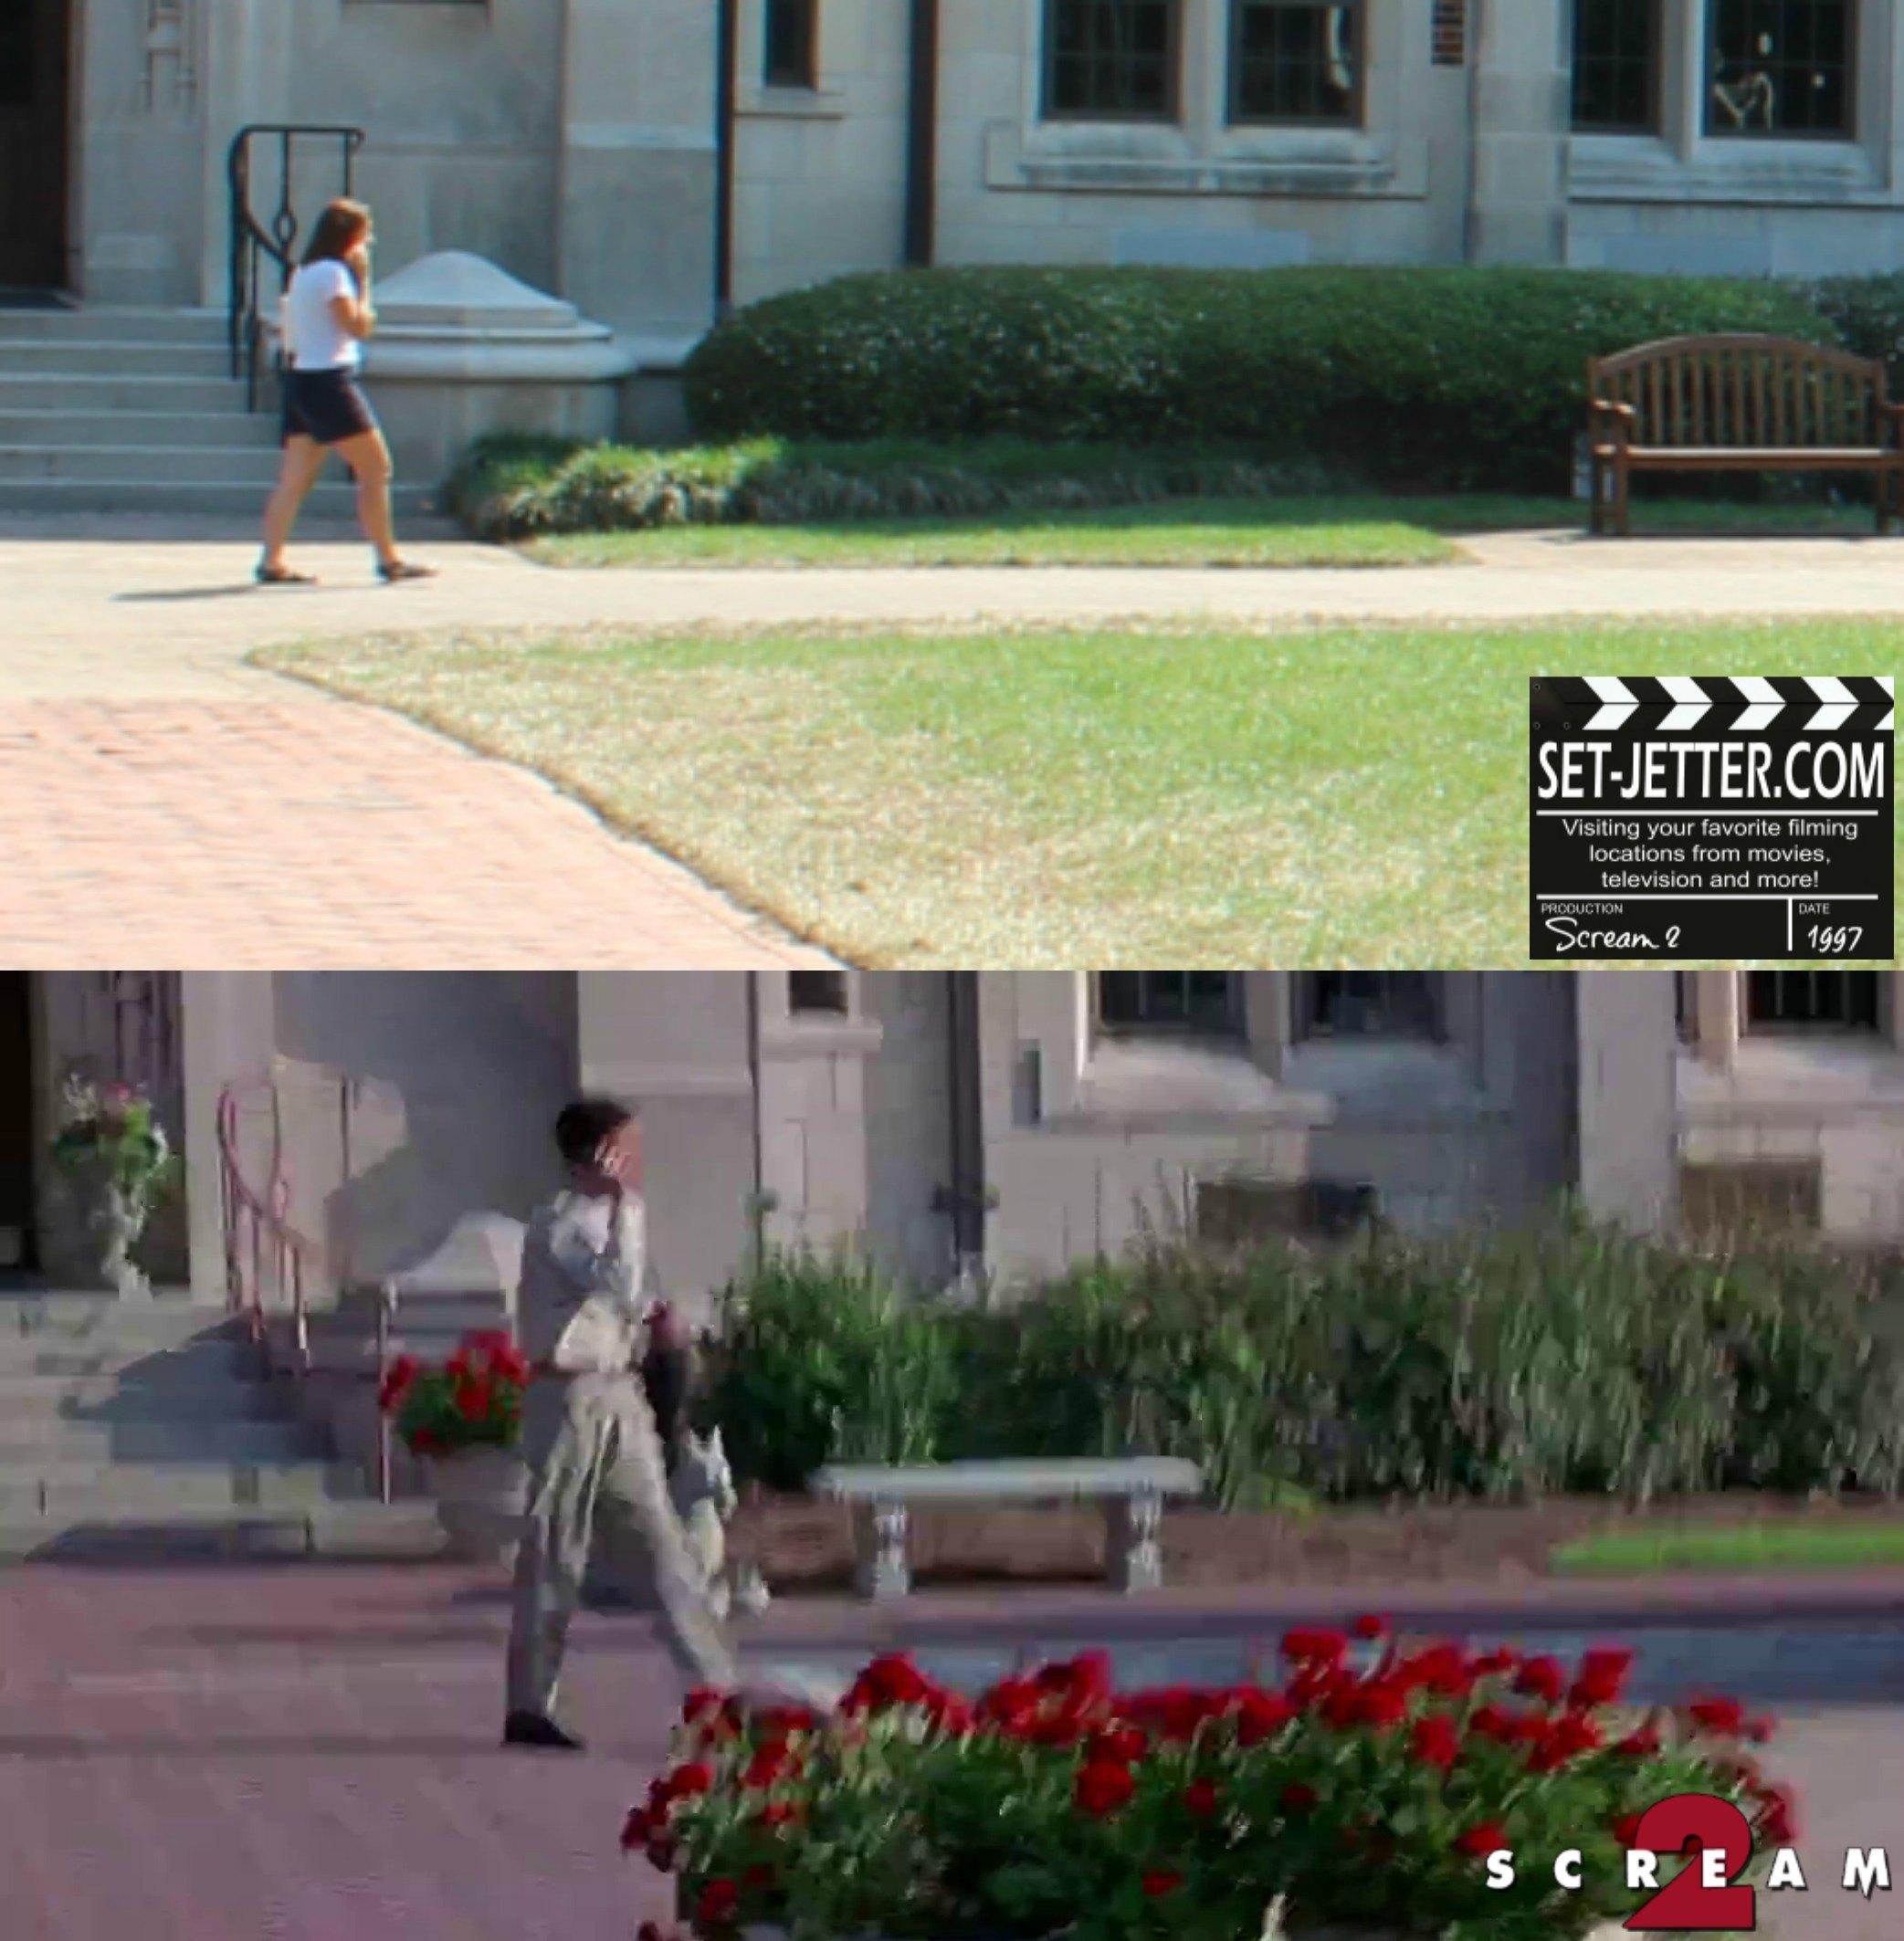 Scream 2 comparison 162.jpg